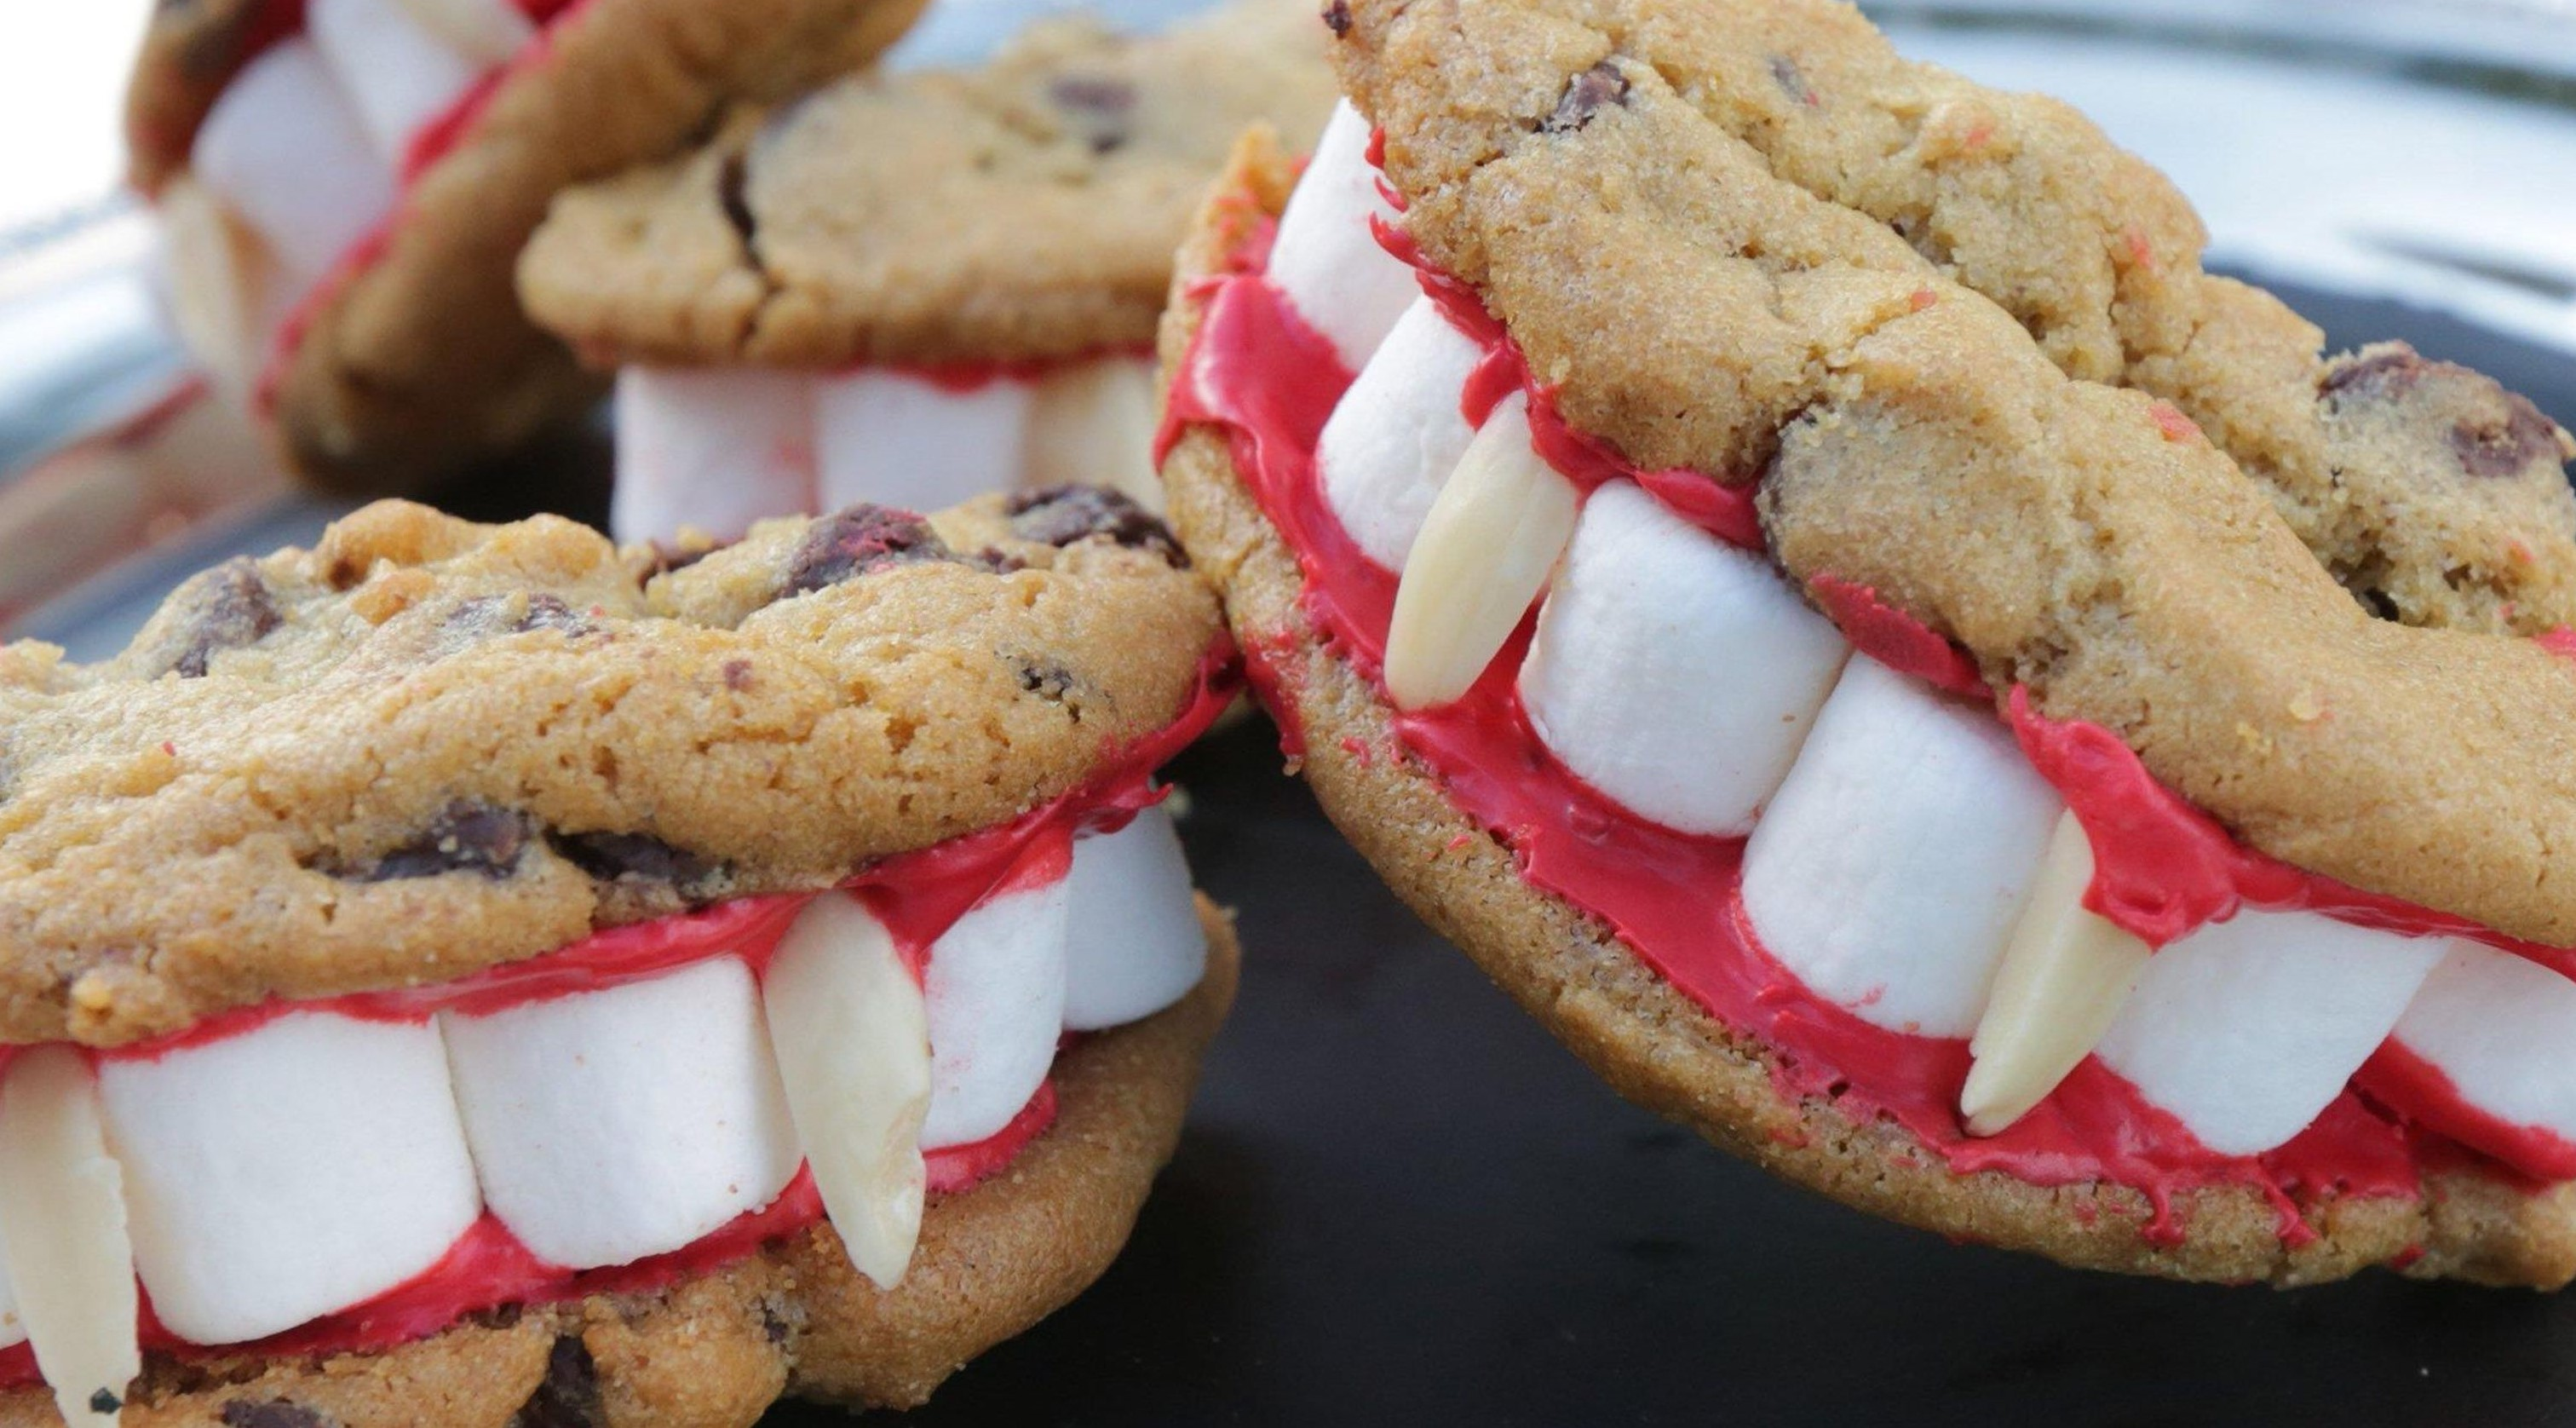 Dracula dentures | 15 Easy Halloween Cookie Ideas | Her Beauty